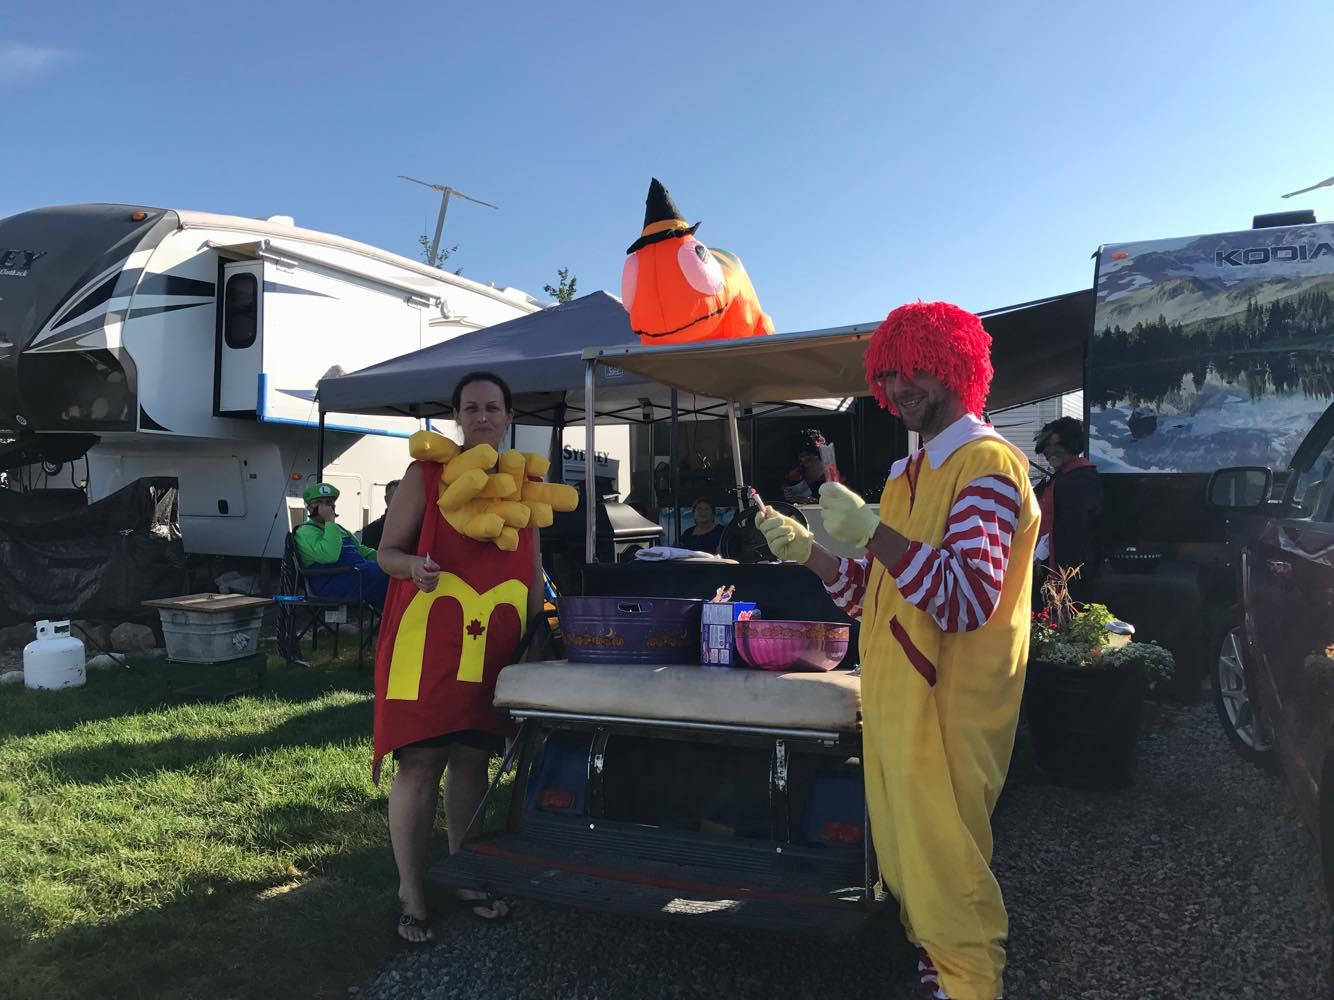 http://www.campingatlantide.com/wp-content/uploads/2018/08/halloween-complexe-atlantide-2018-5.jpg